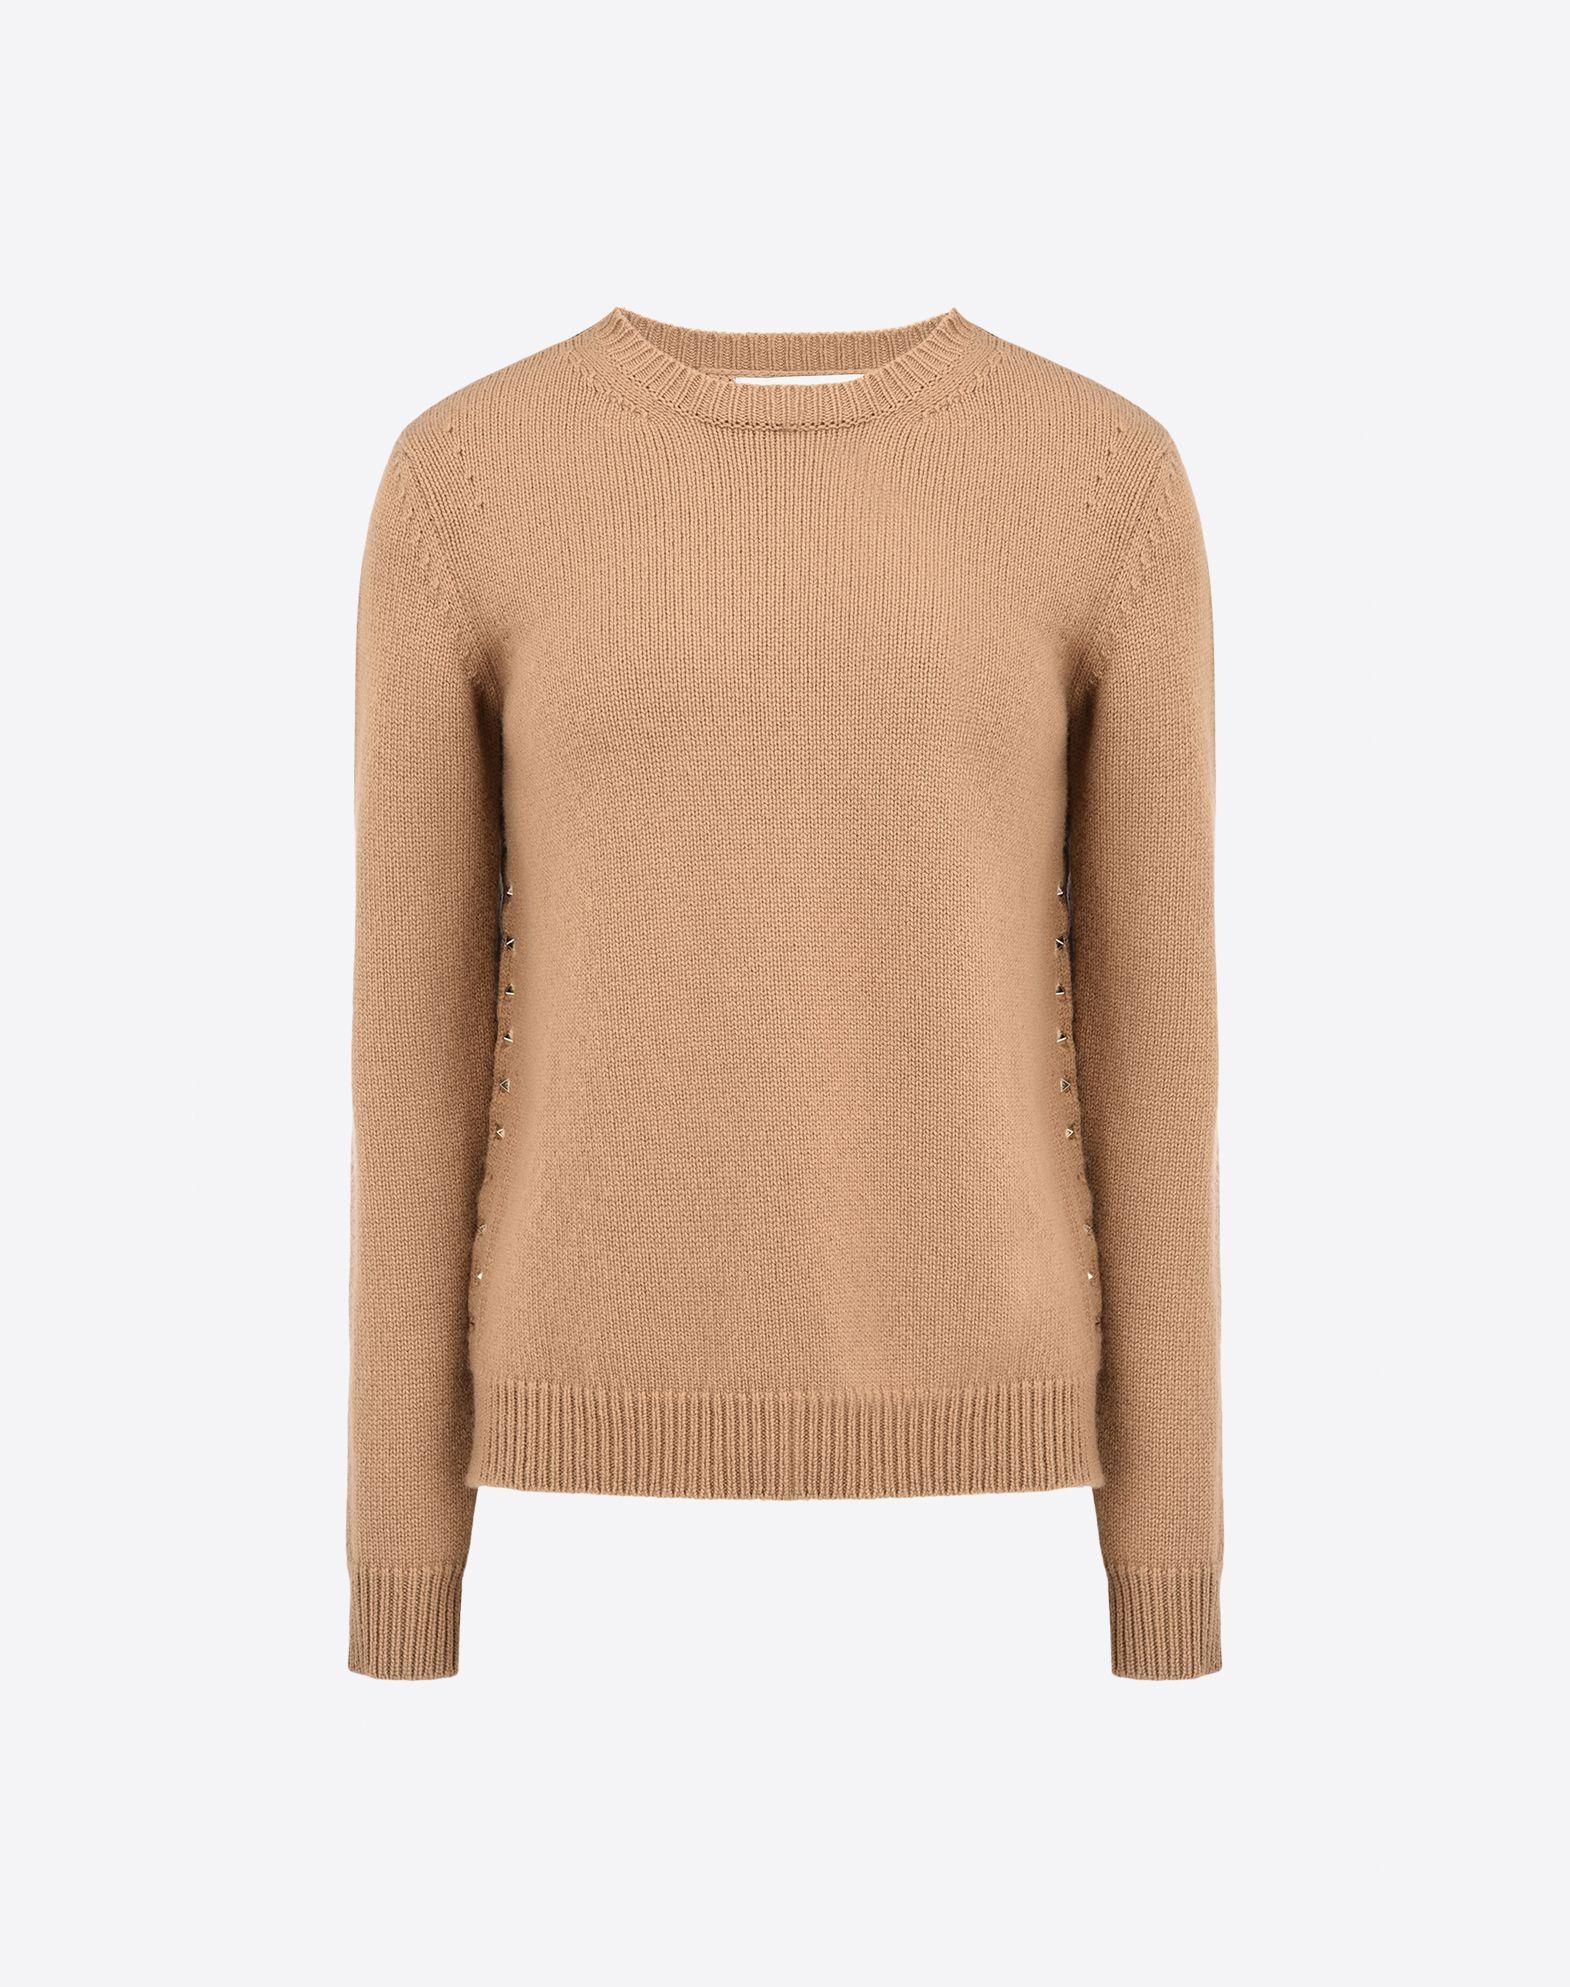 VALENTINO Studs Lightweight knitted Solid colour Round collar Long sleeves Side slit hemline  39635593jj